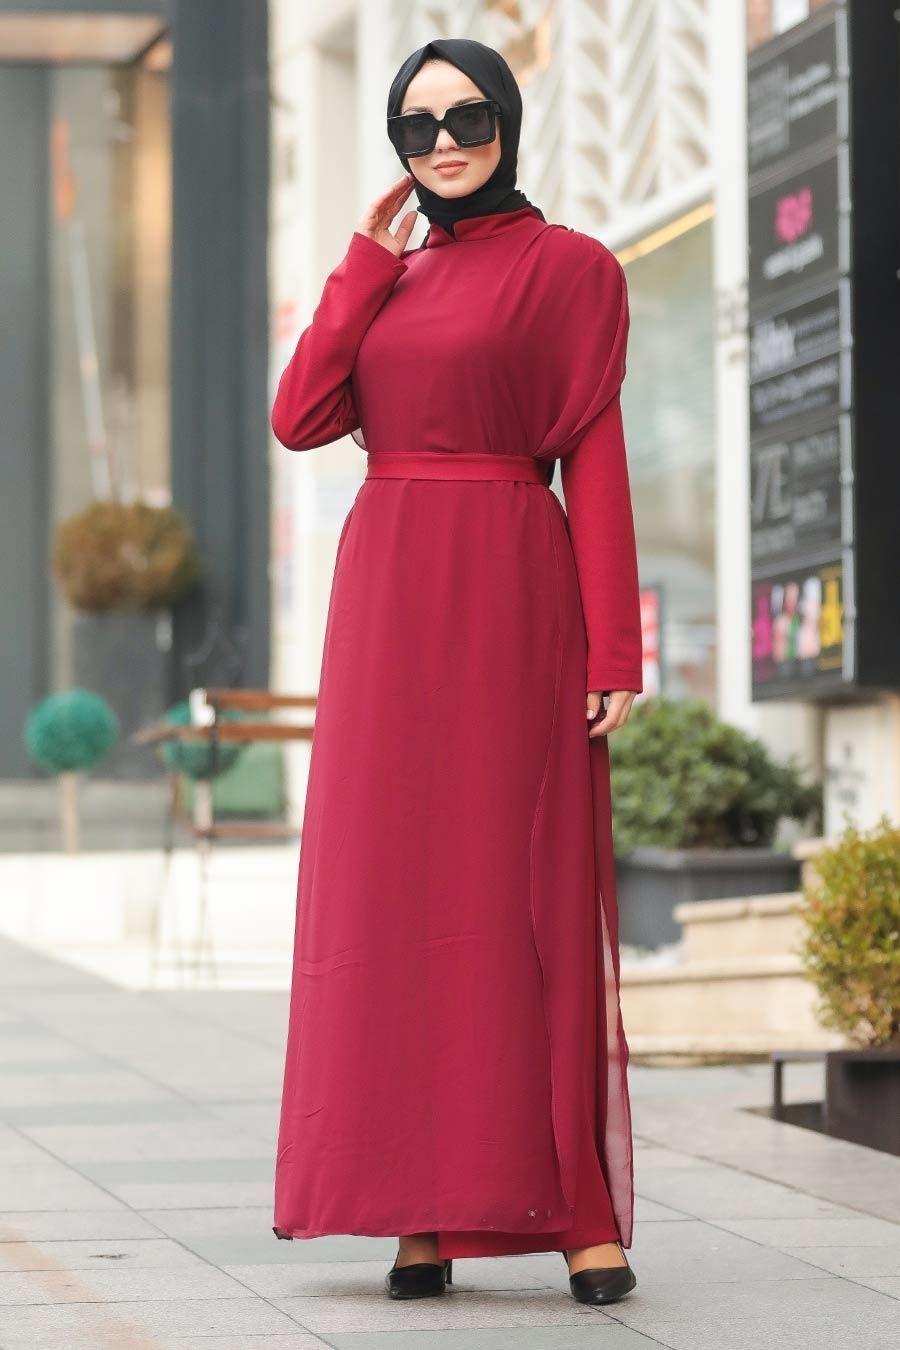 Tesetturlu Abiye Elbise Tullu Bordo Tesettur Abiye Tulum 51182br Tesettur Tesettur Abiye Modelleri 2020 In 2020 Dresses High Neck Dress Fashion